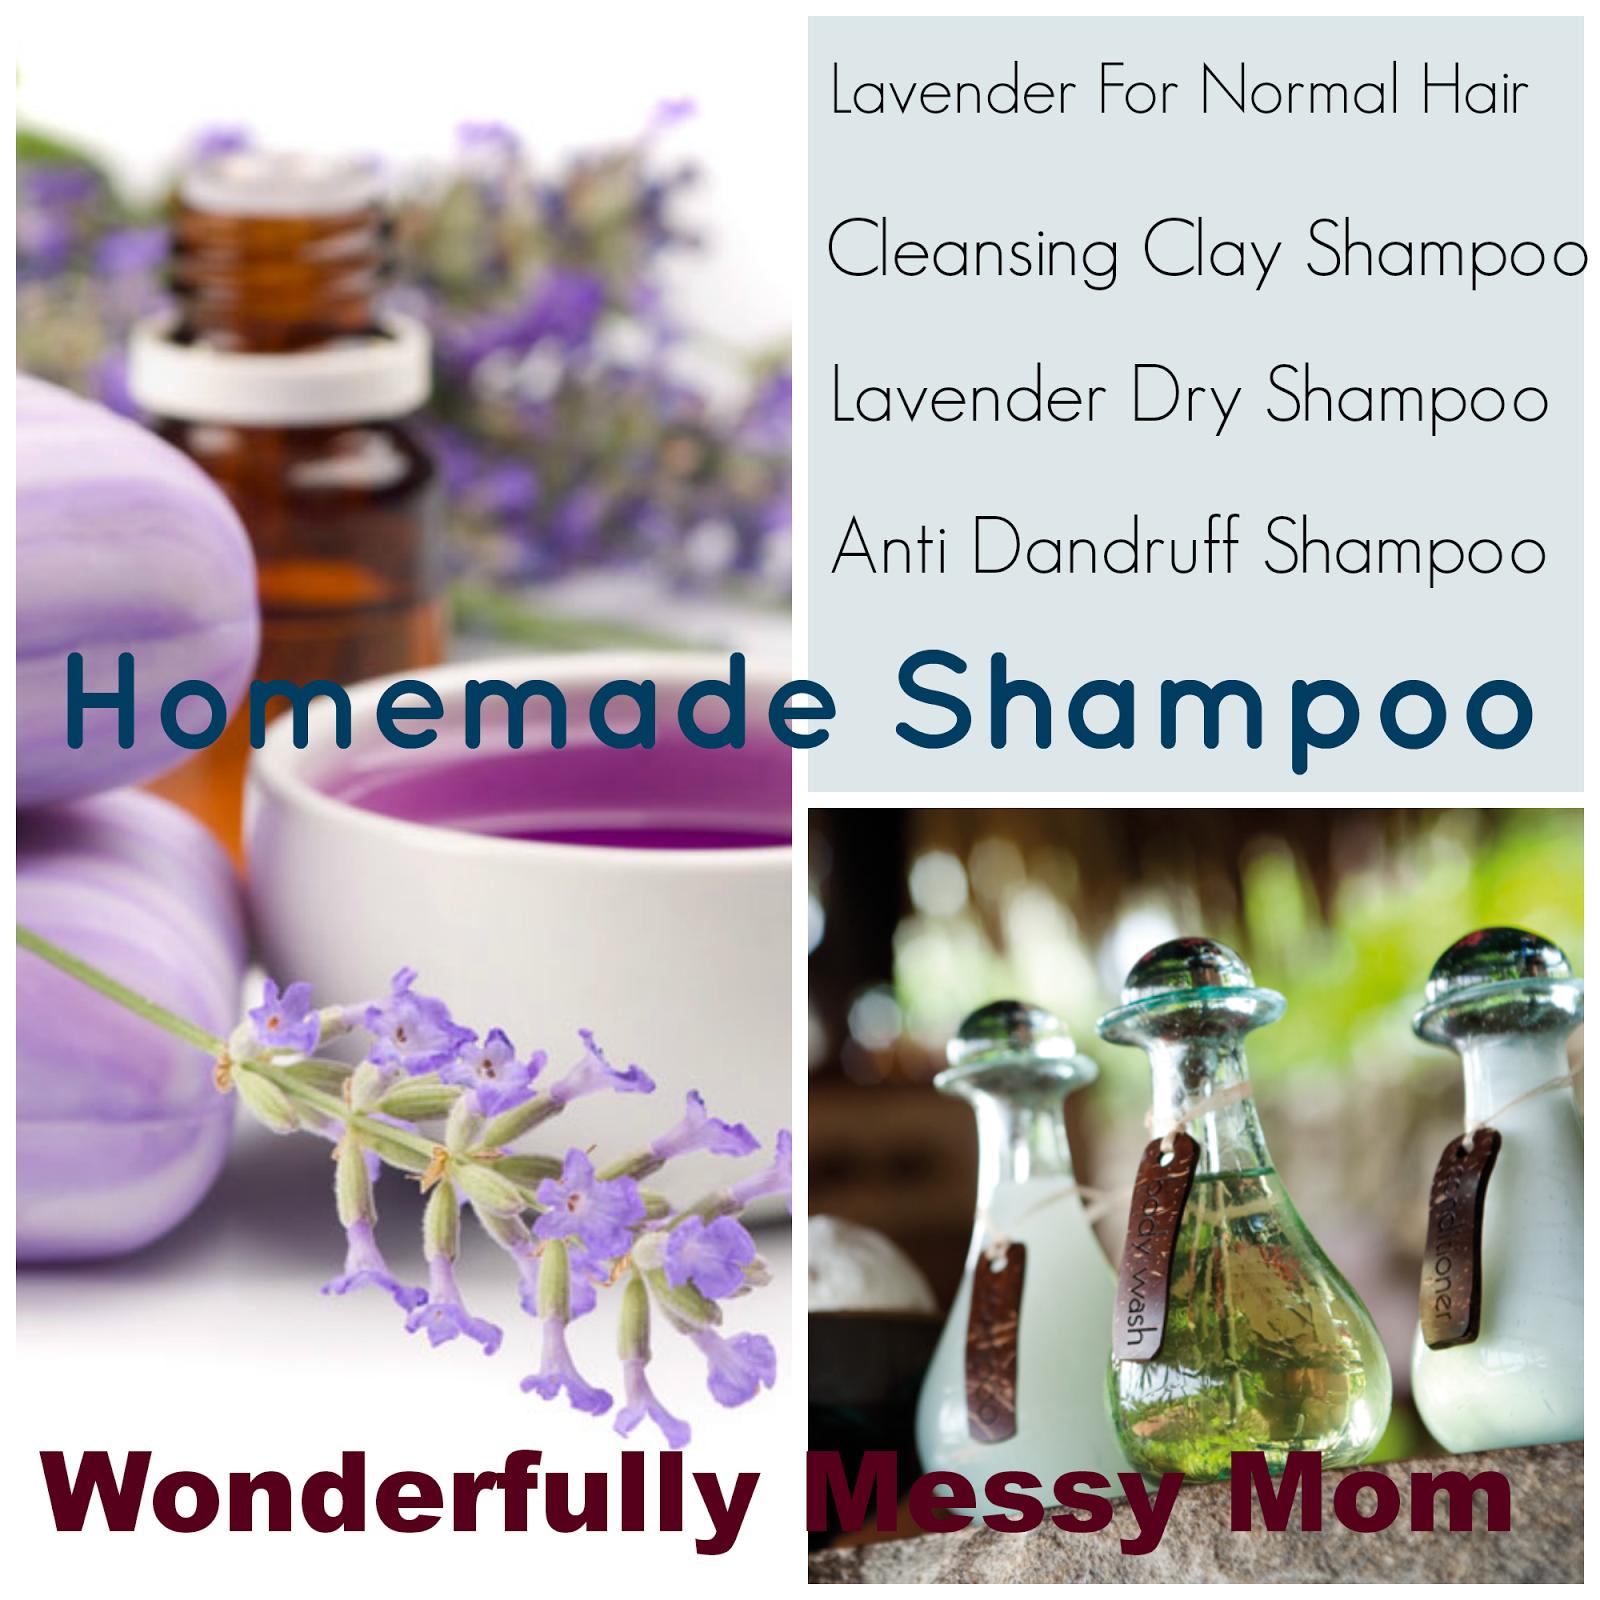 homemade shampoo~ lavender dry shampoo, anti dandruff shampoo; easy